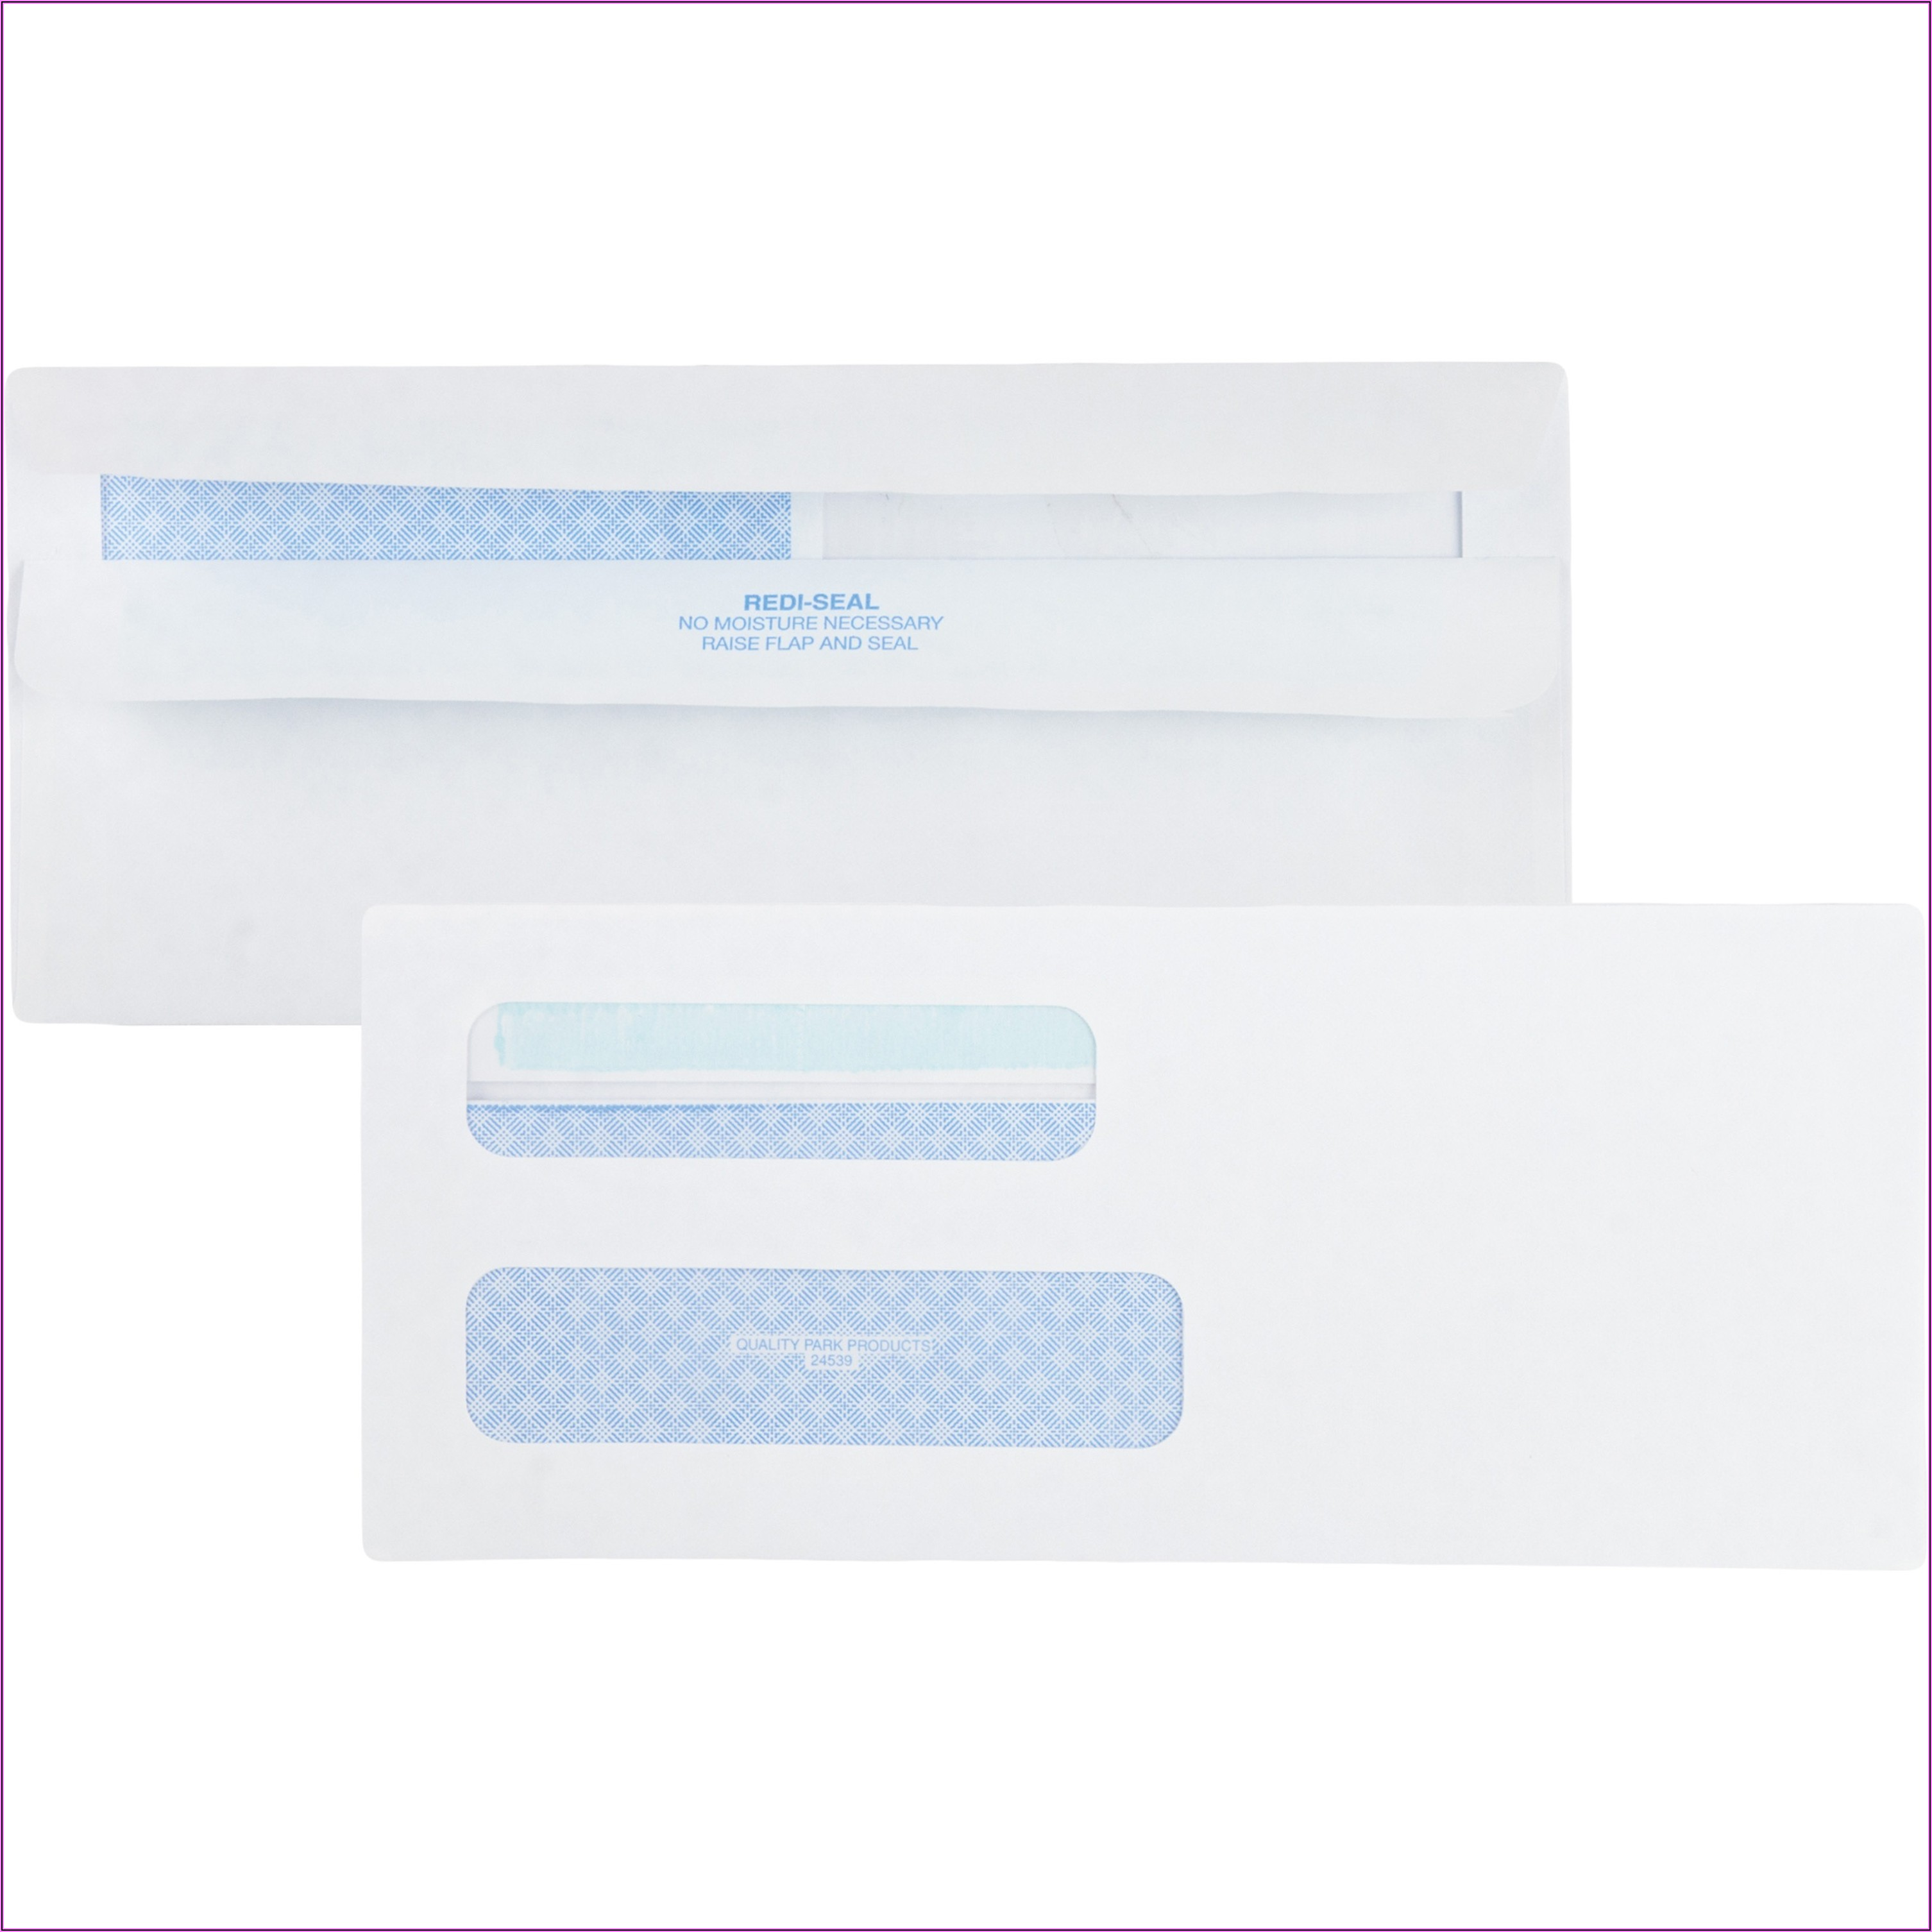 Quality Park Envelopes 24539